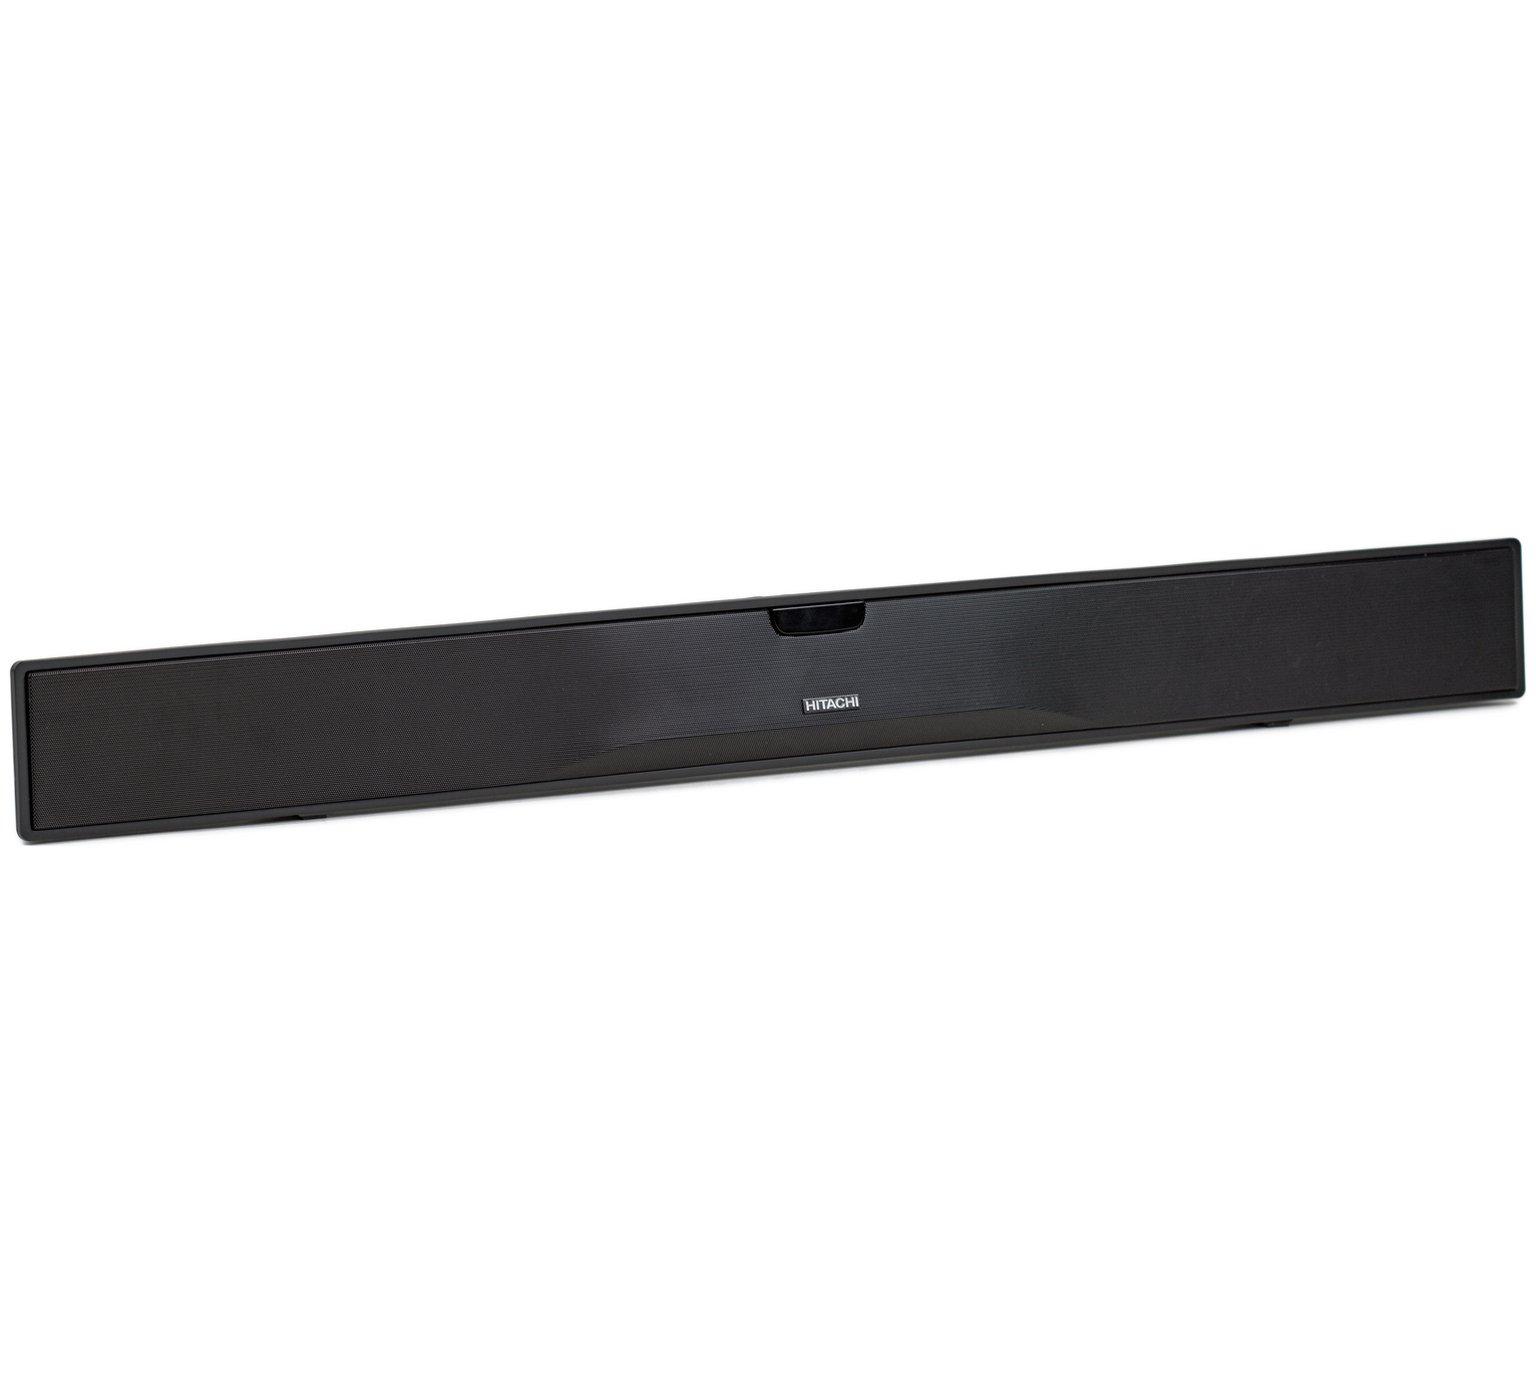 Hitachi 120W 2Ch All In One Sound Bar with Bluetooth